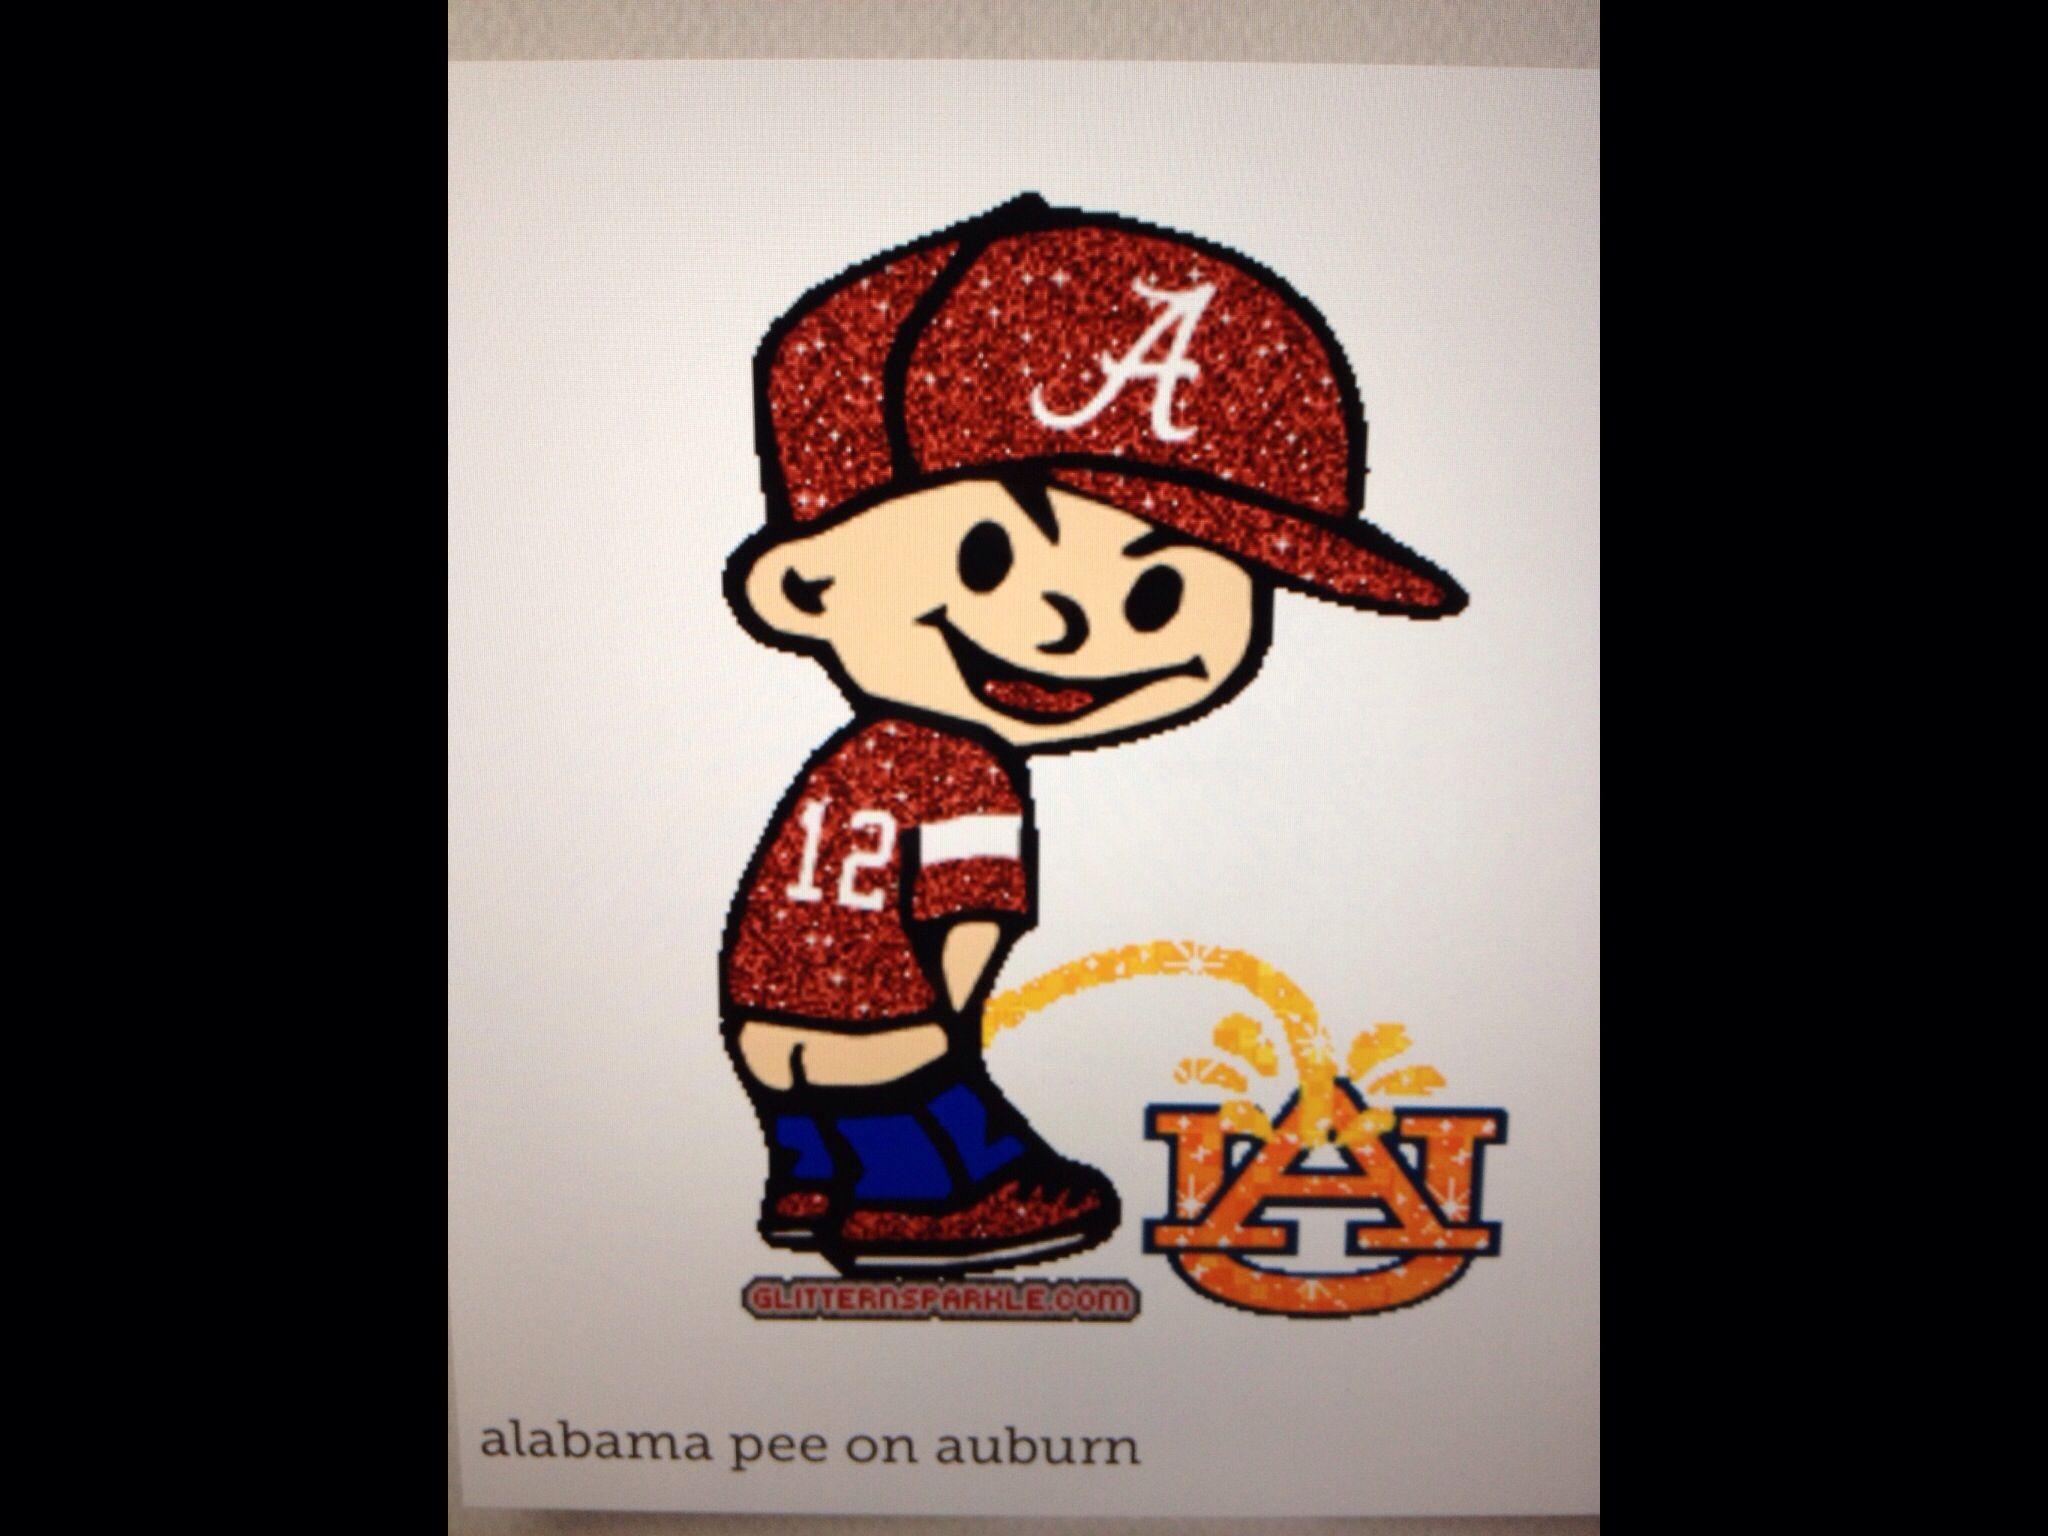 Pee On Auburn Character Vault Boy Alabama Football